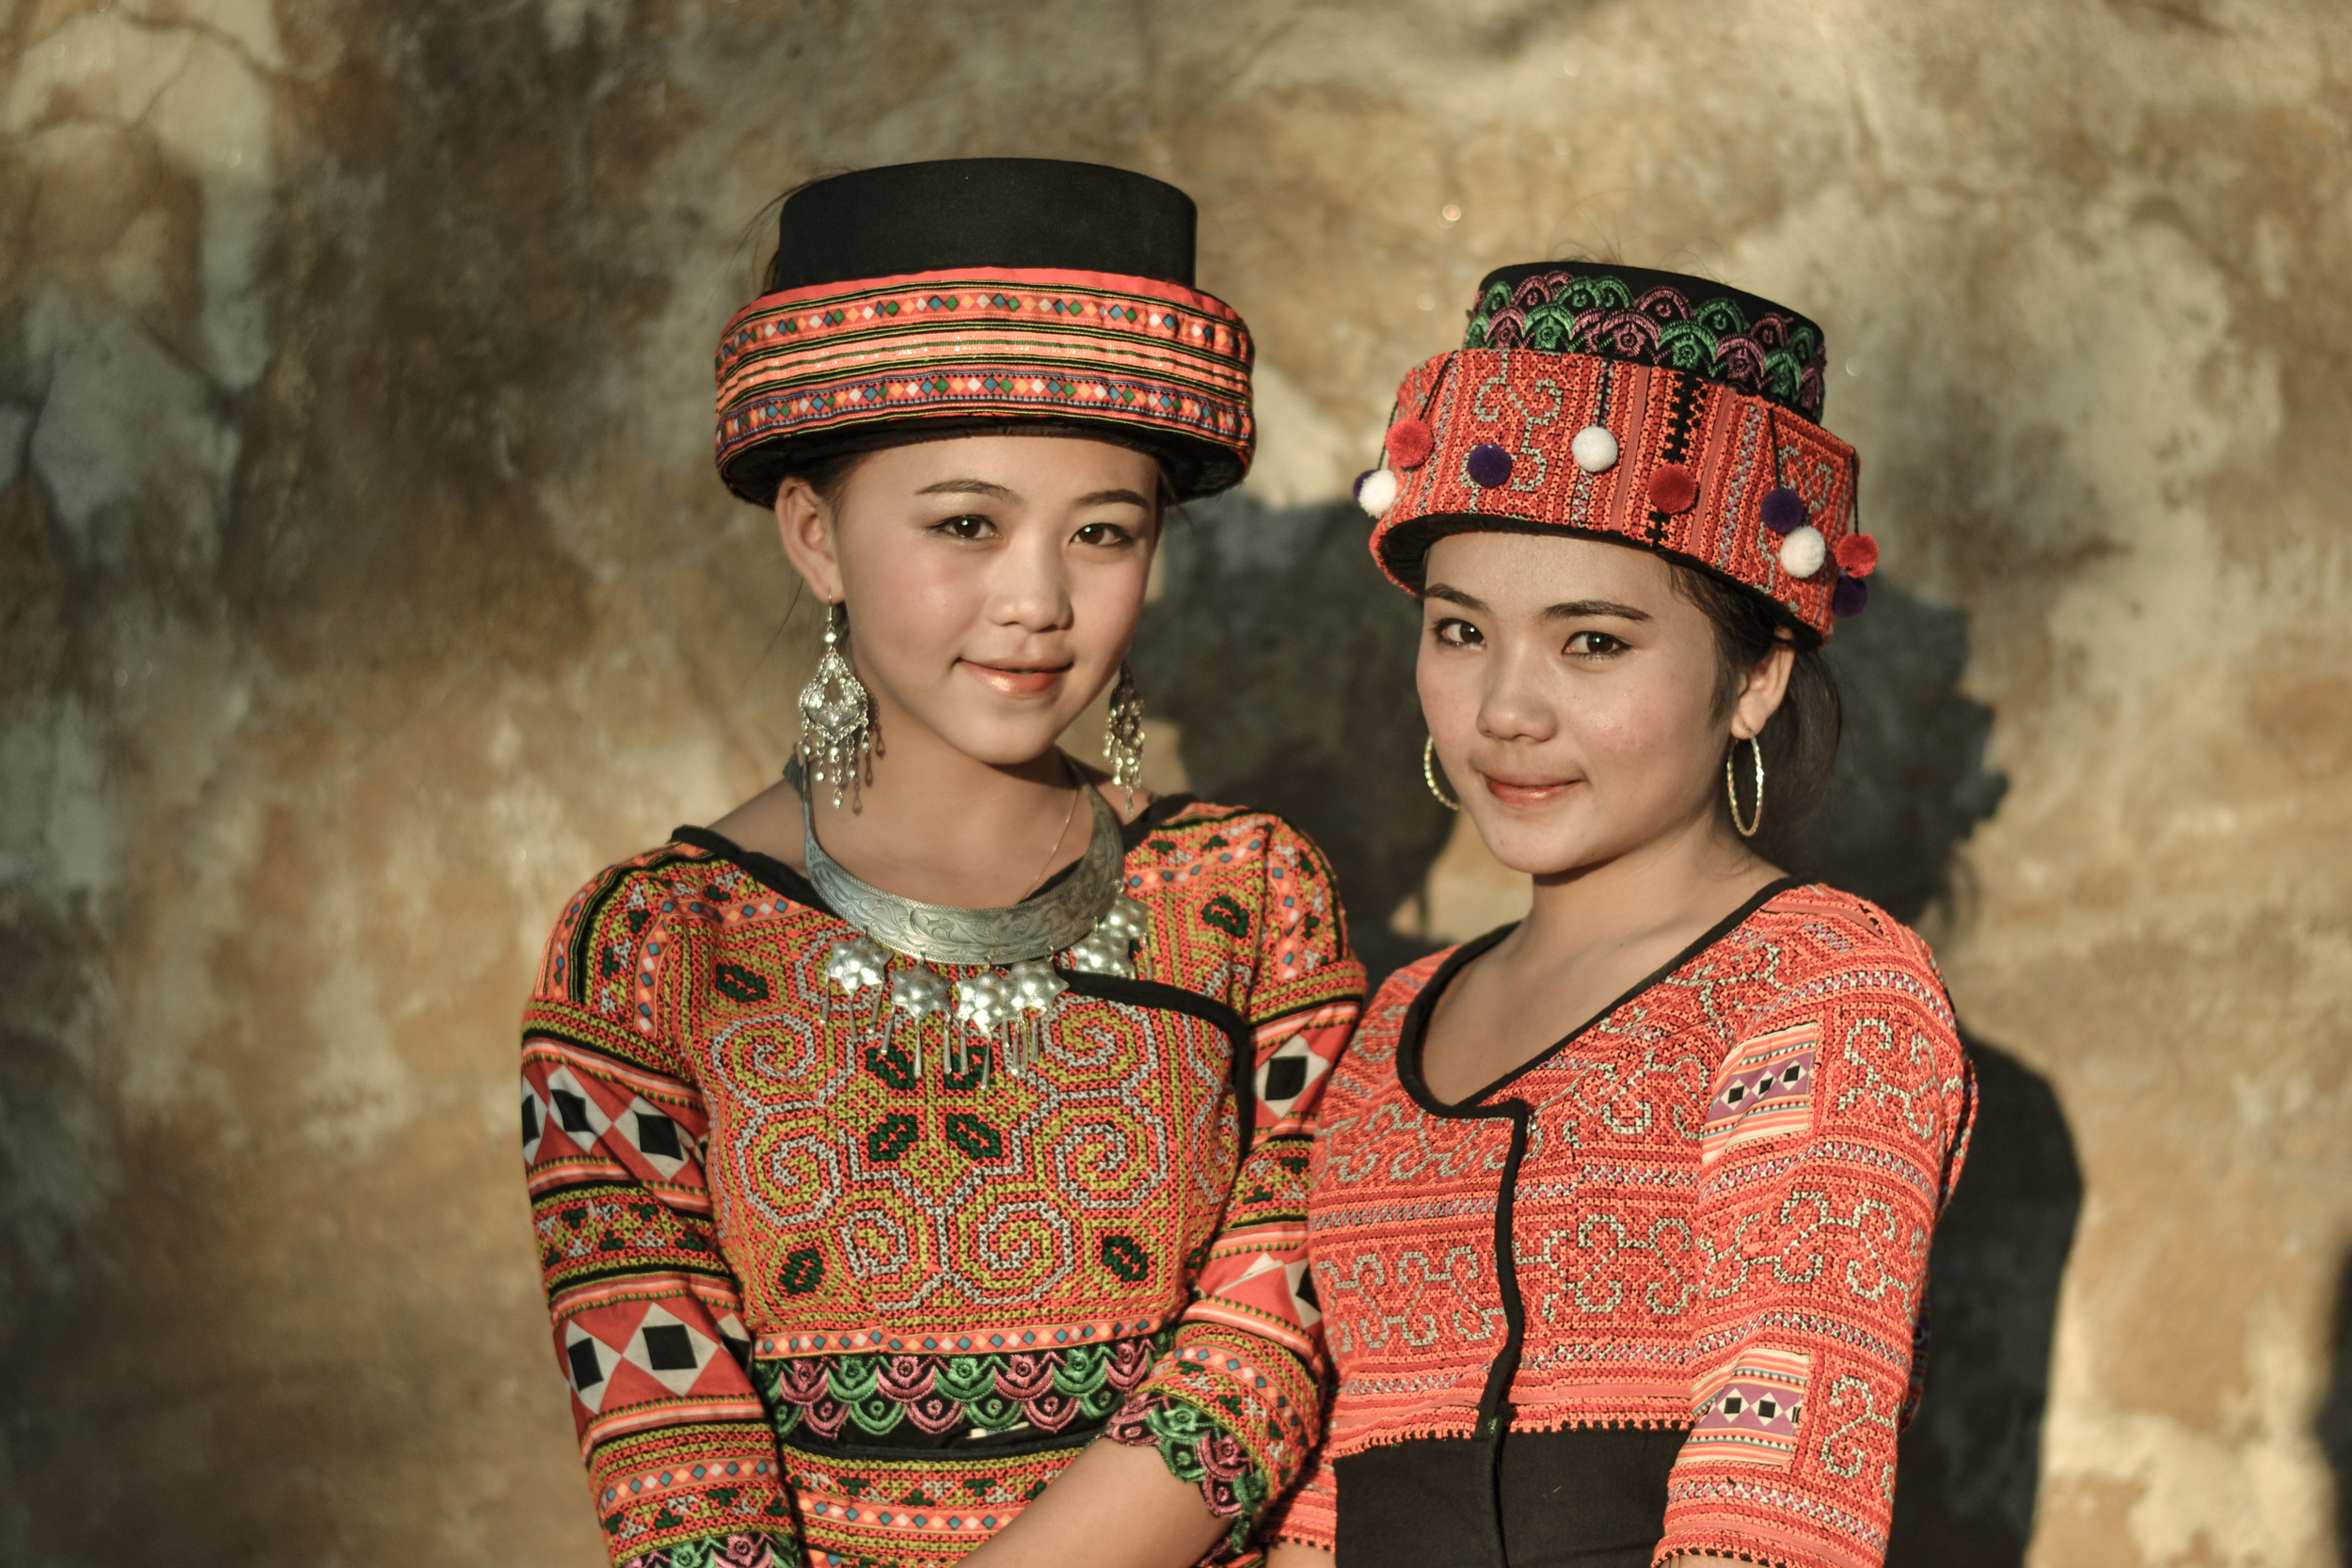 Hmong Style. Hmong New Year, Luang Prabang